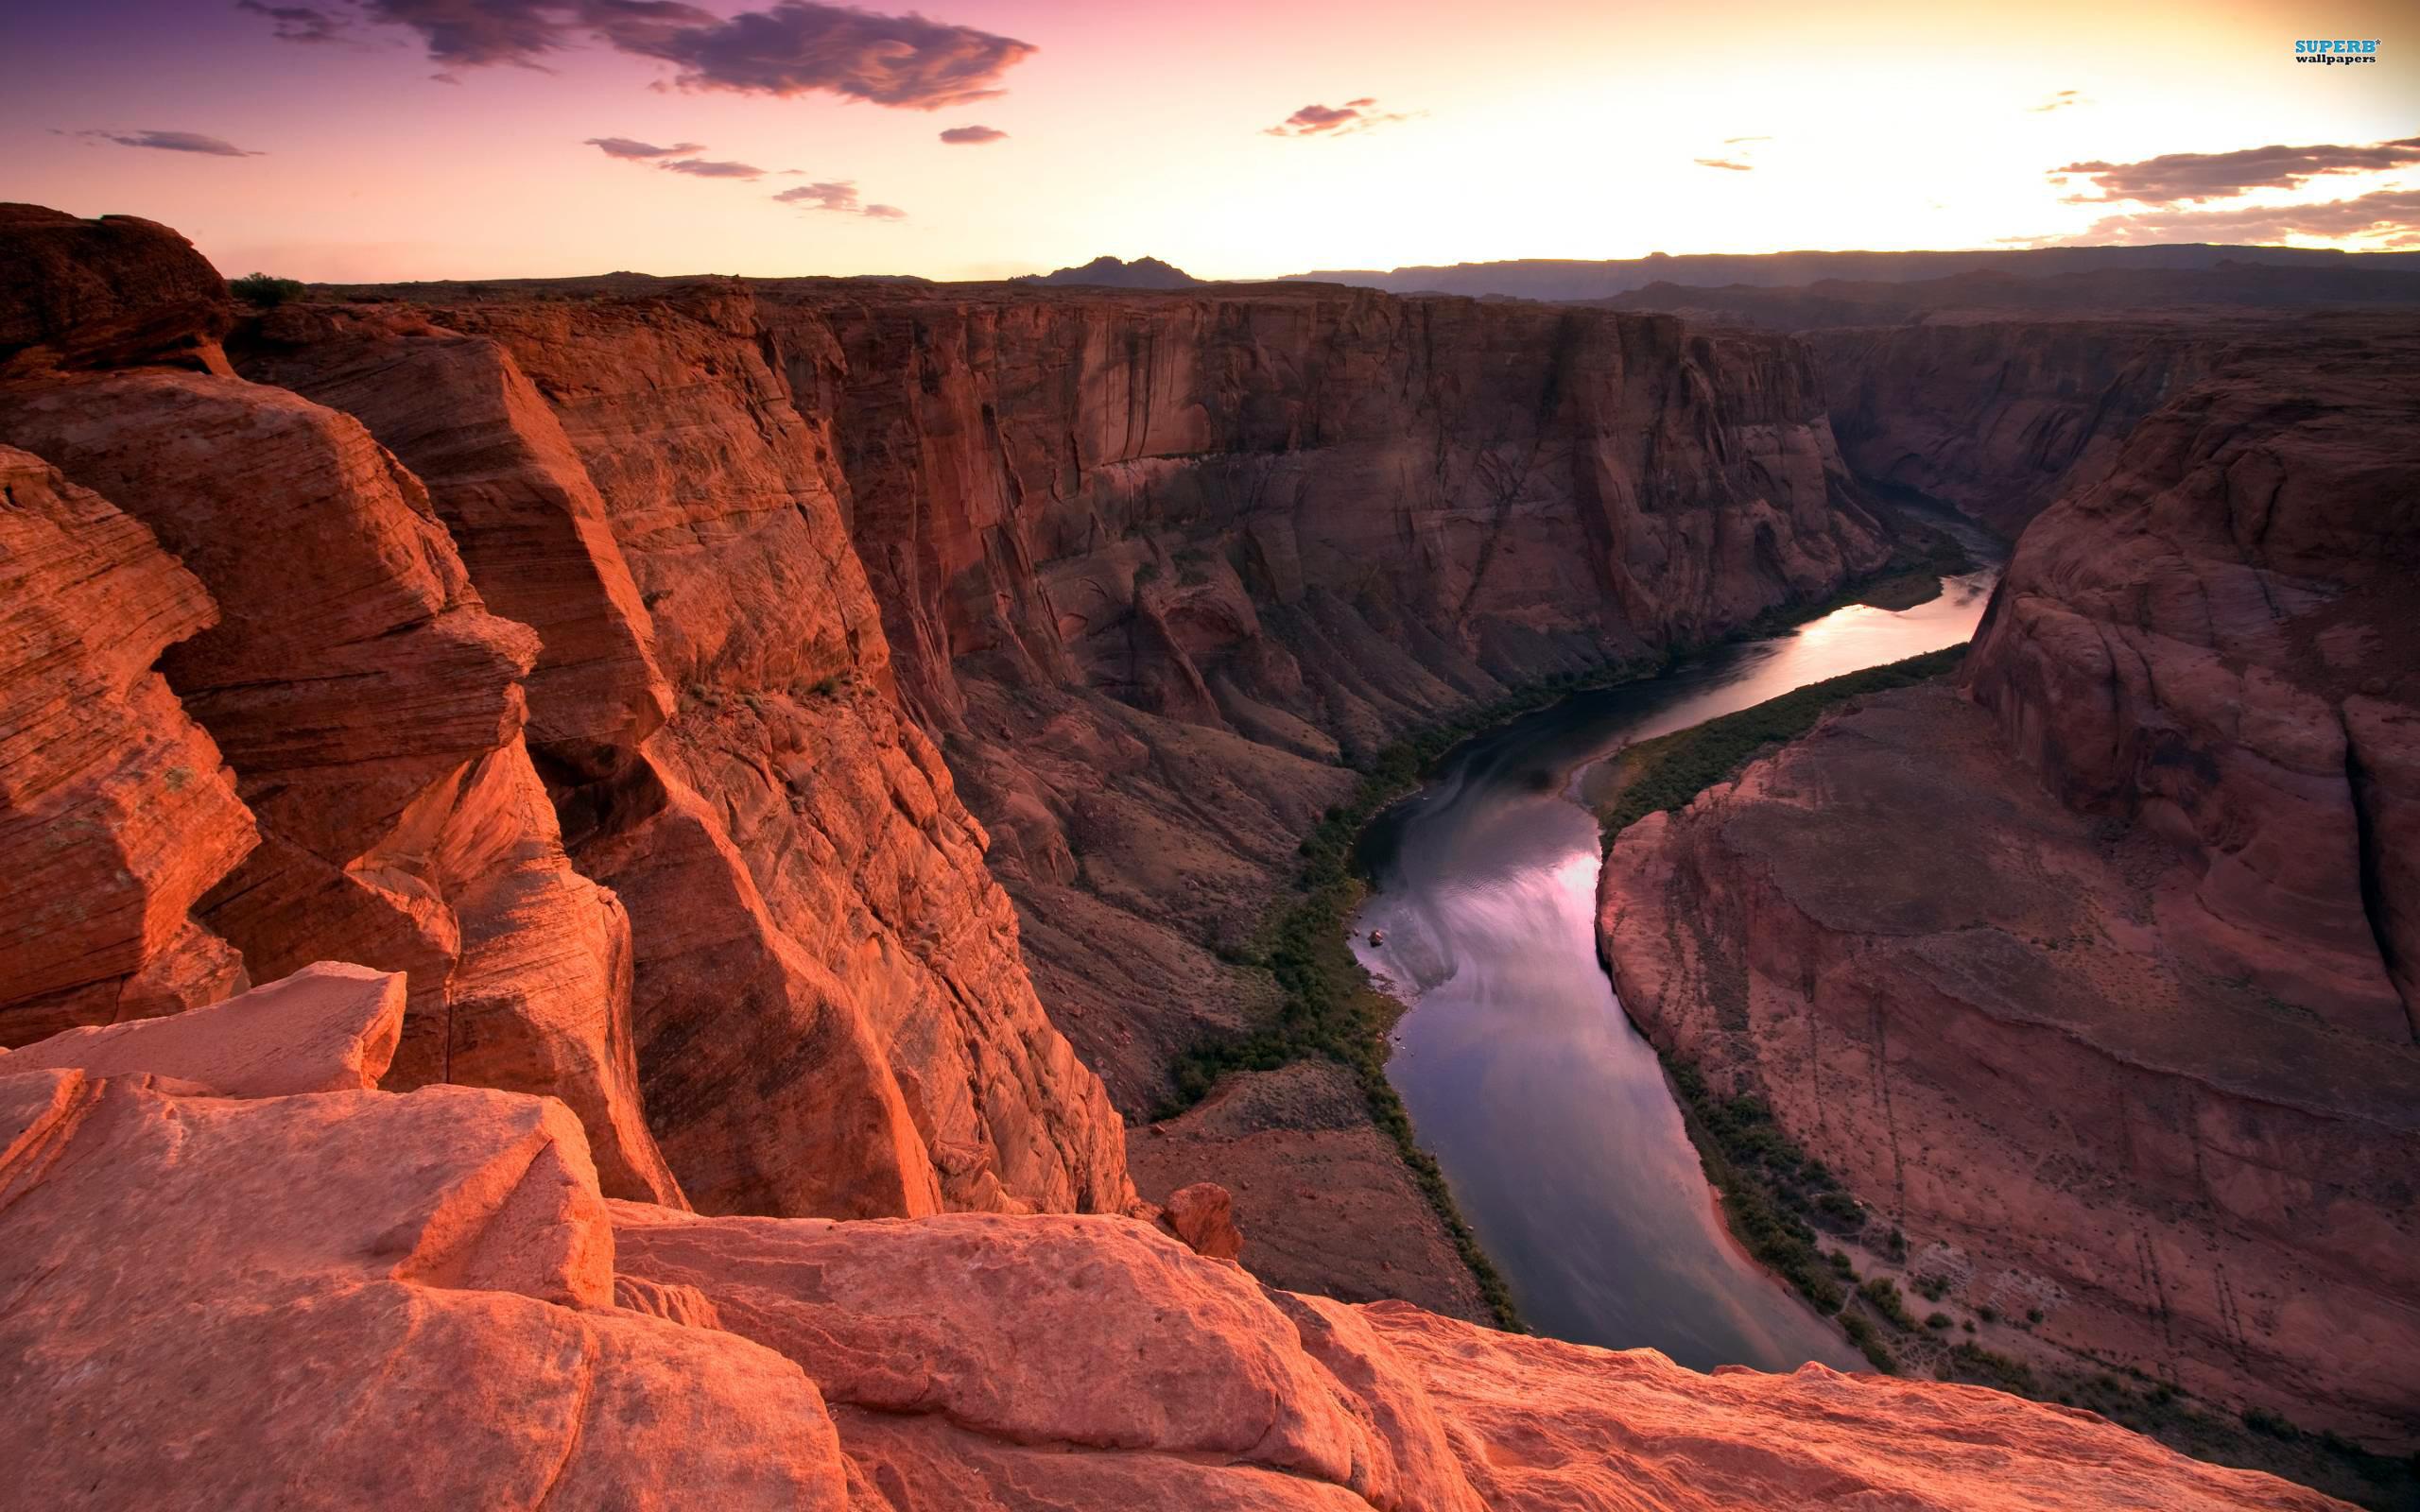 Colorado River wallpaper 2560x1600